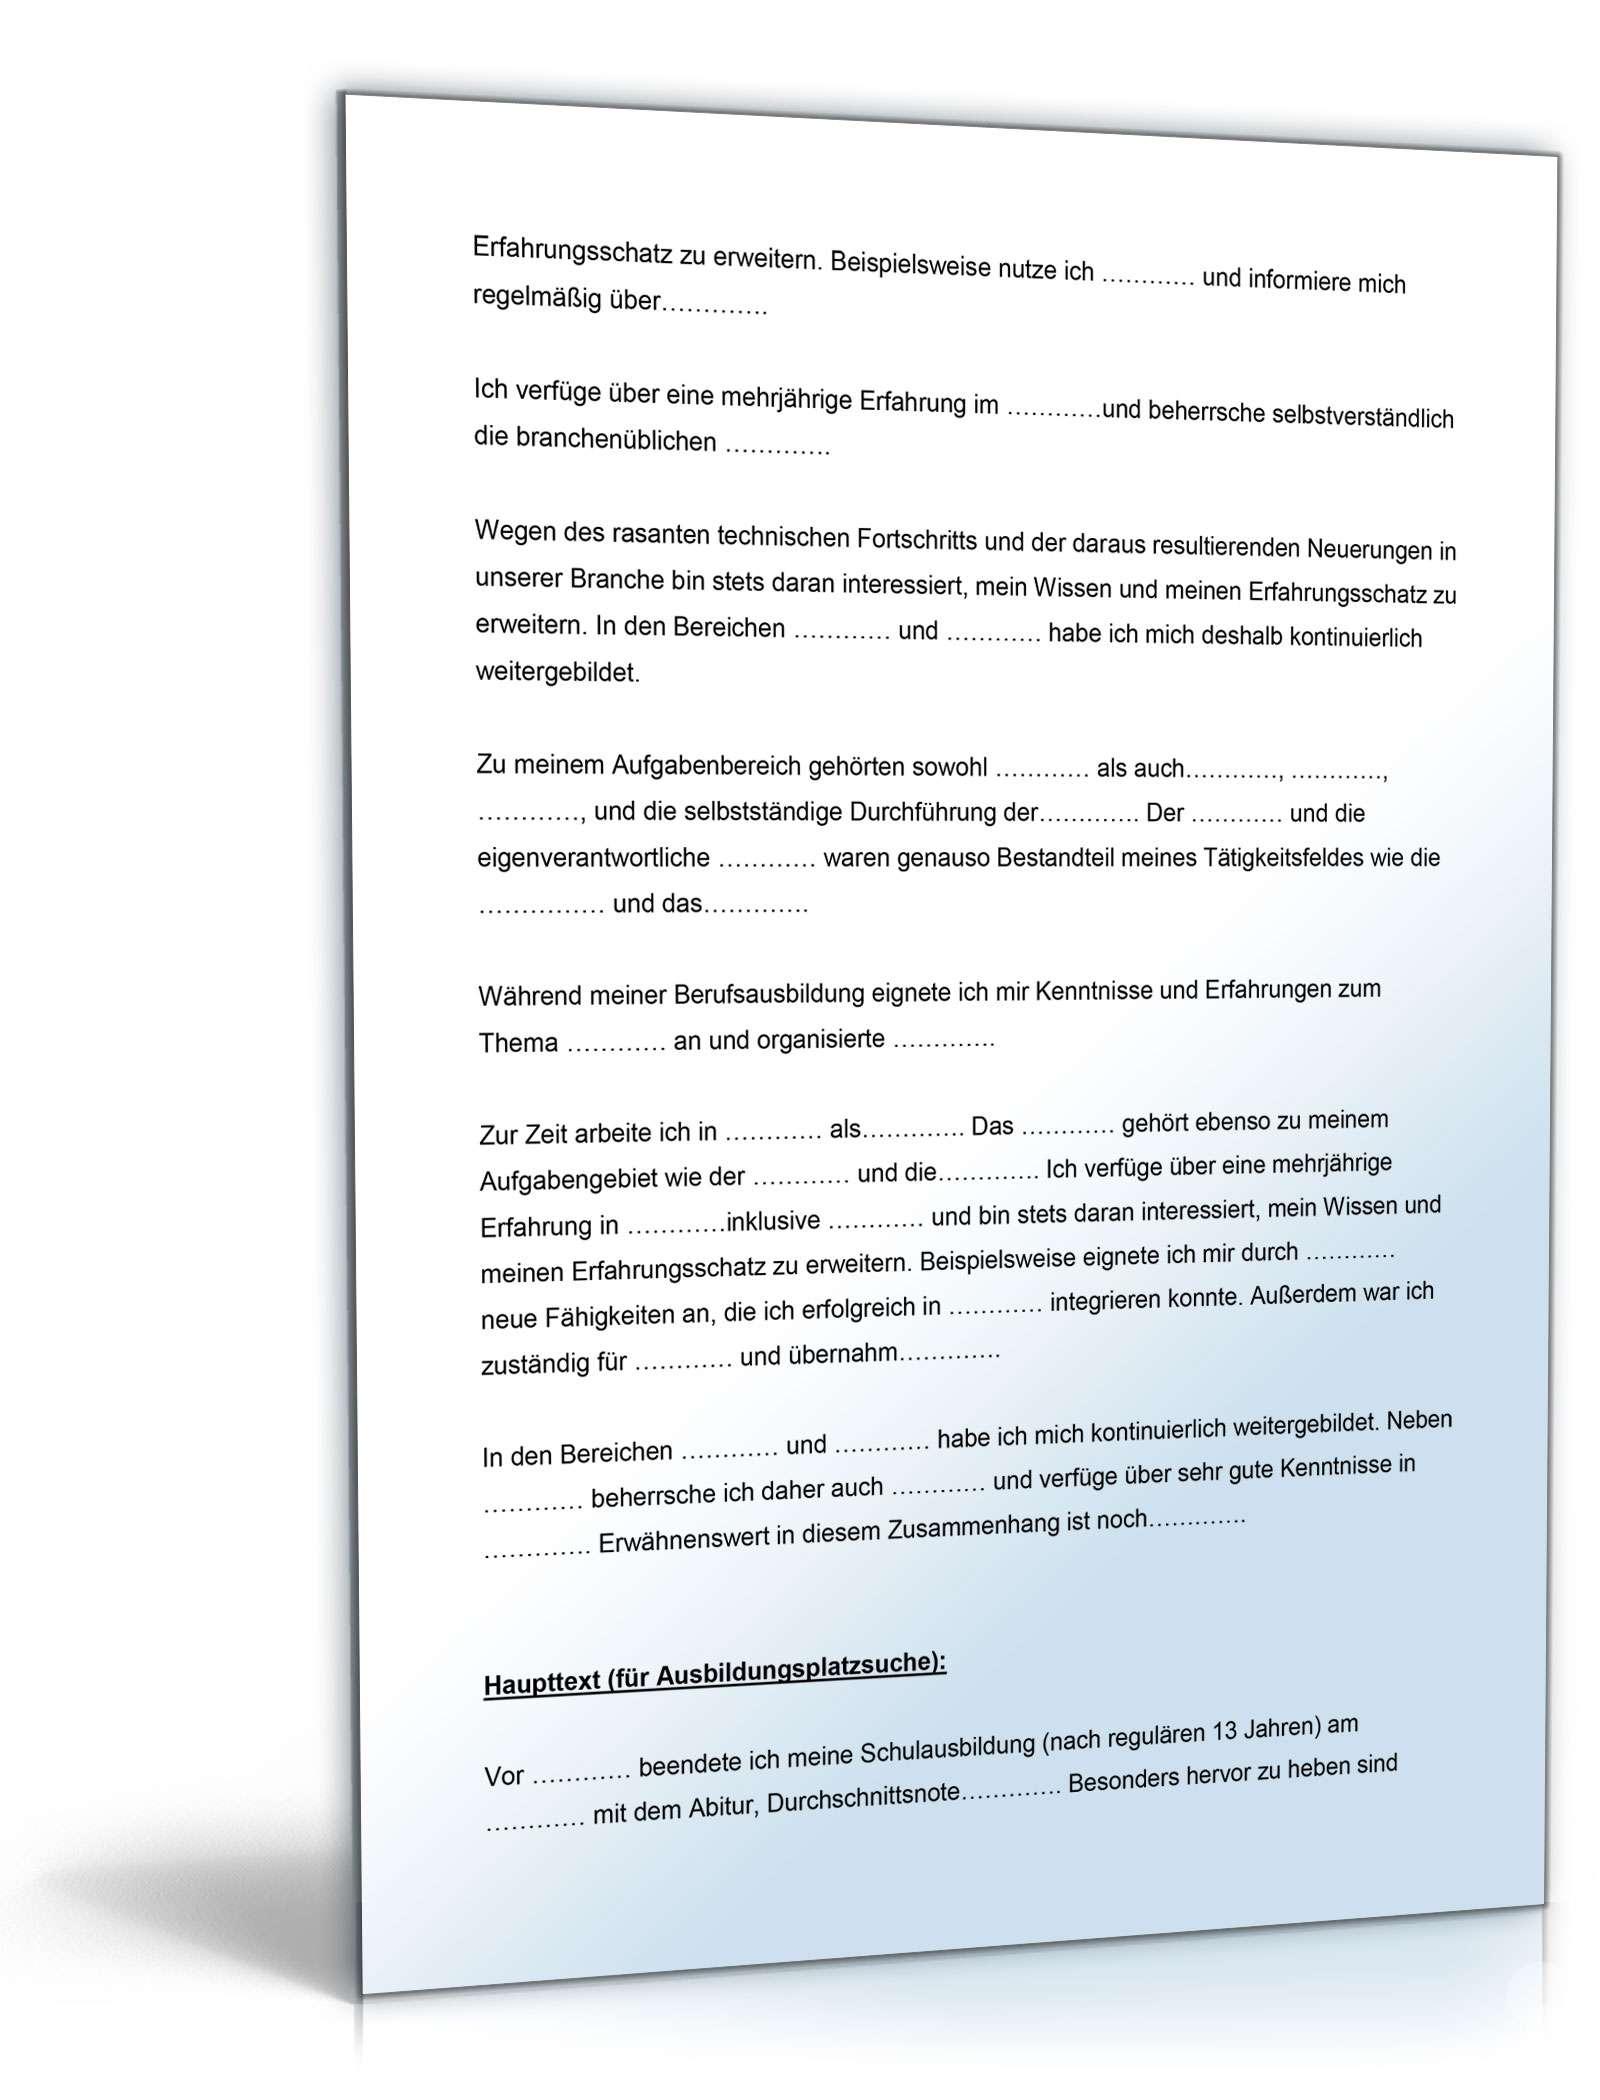 bewerbungs paket chemikant muster zum download - Bewerbung Chemikant